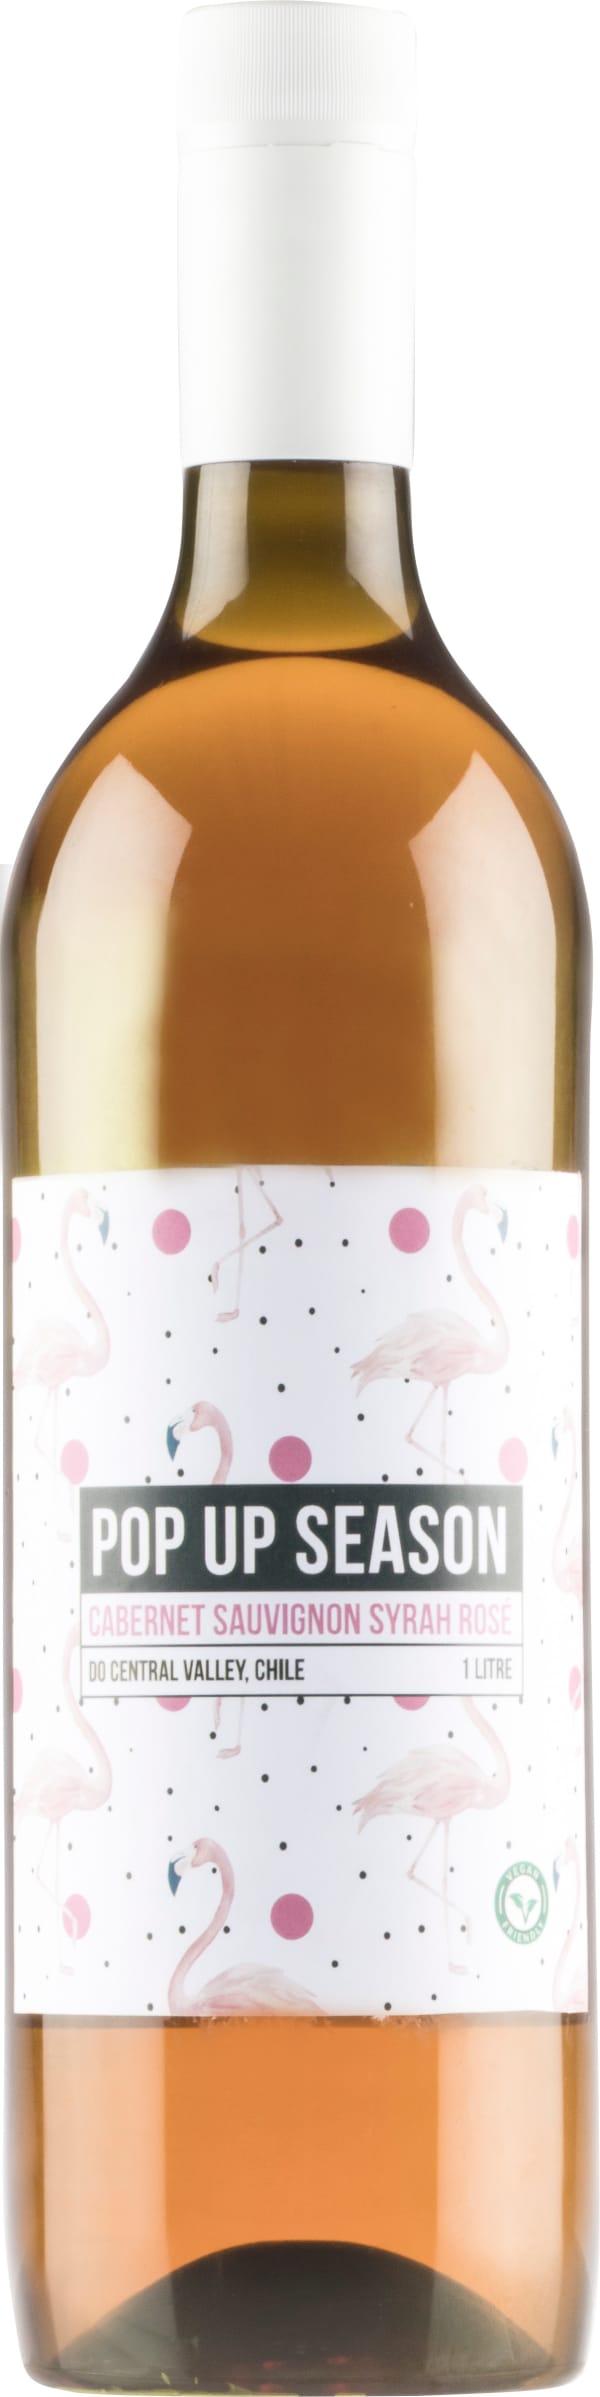 Pop Up Season Cabernet Sauvignon Syrah Rosé  2019 plastflaska